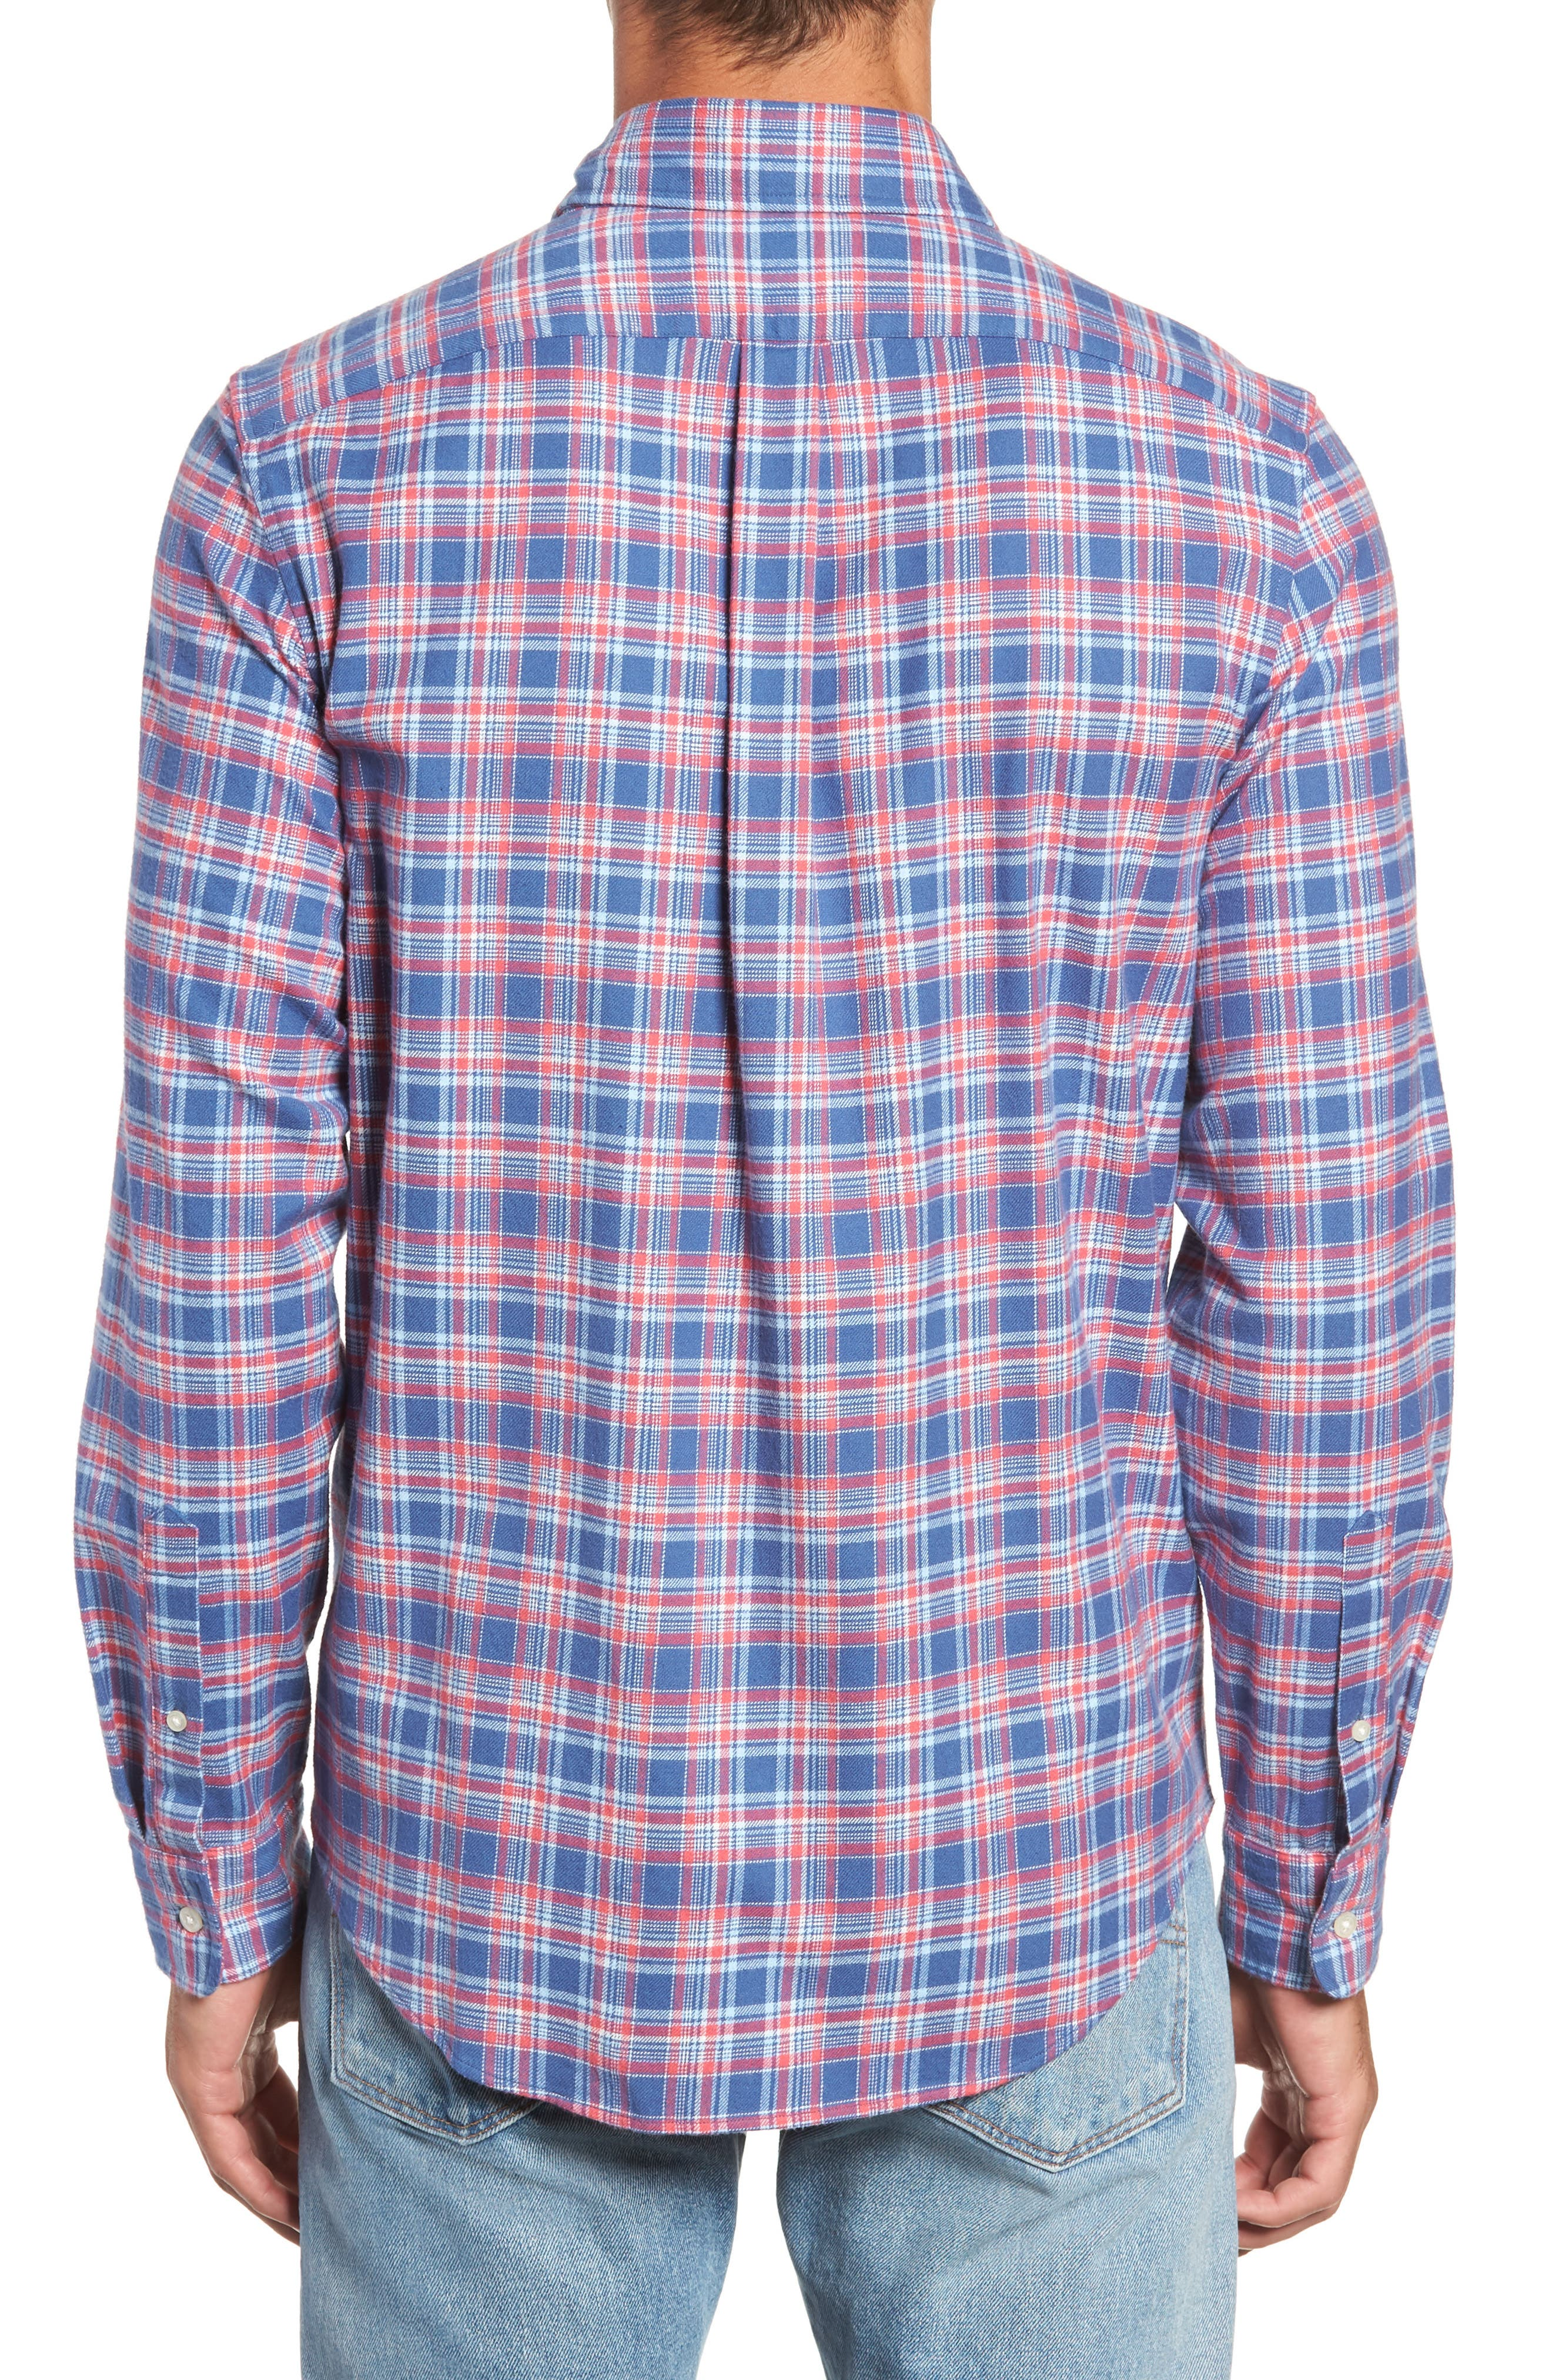 VINEYARD VINES,                             Lockwood Regular Fit Plaid Flannel Shirt,                             Alternate thumbnail 3, color,                             463